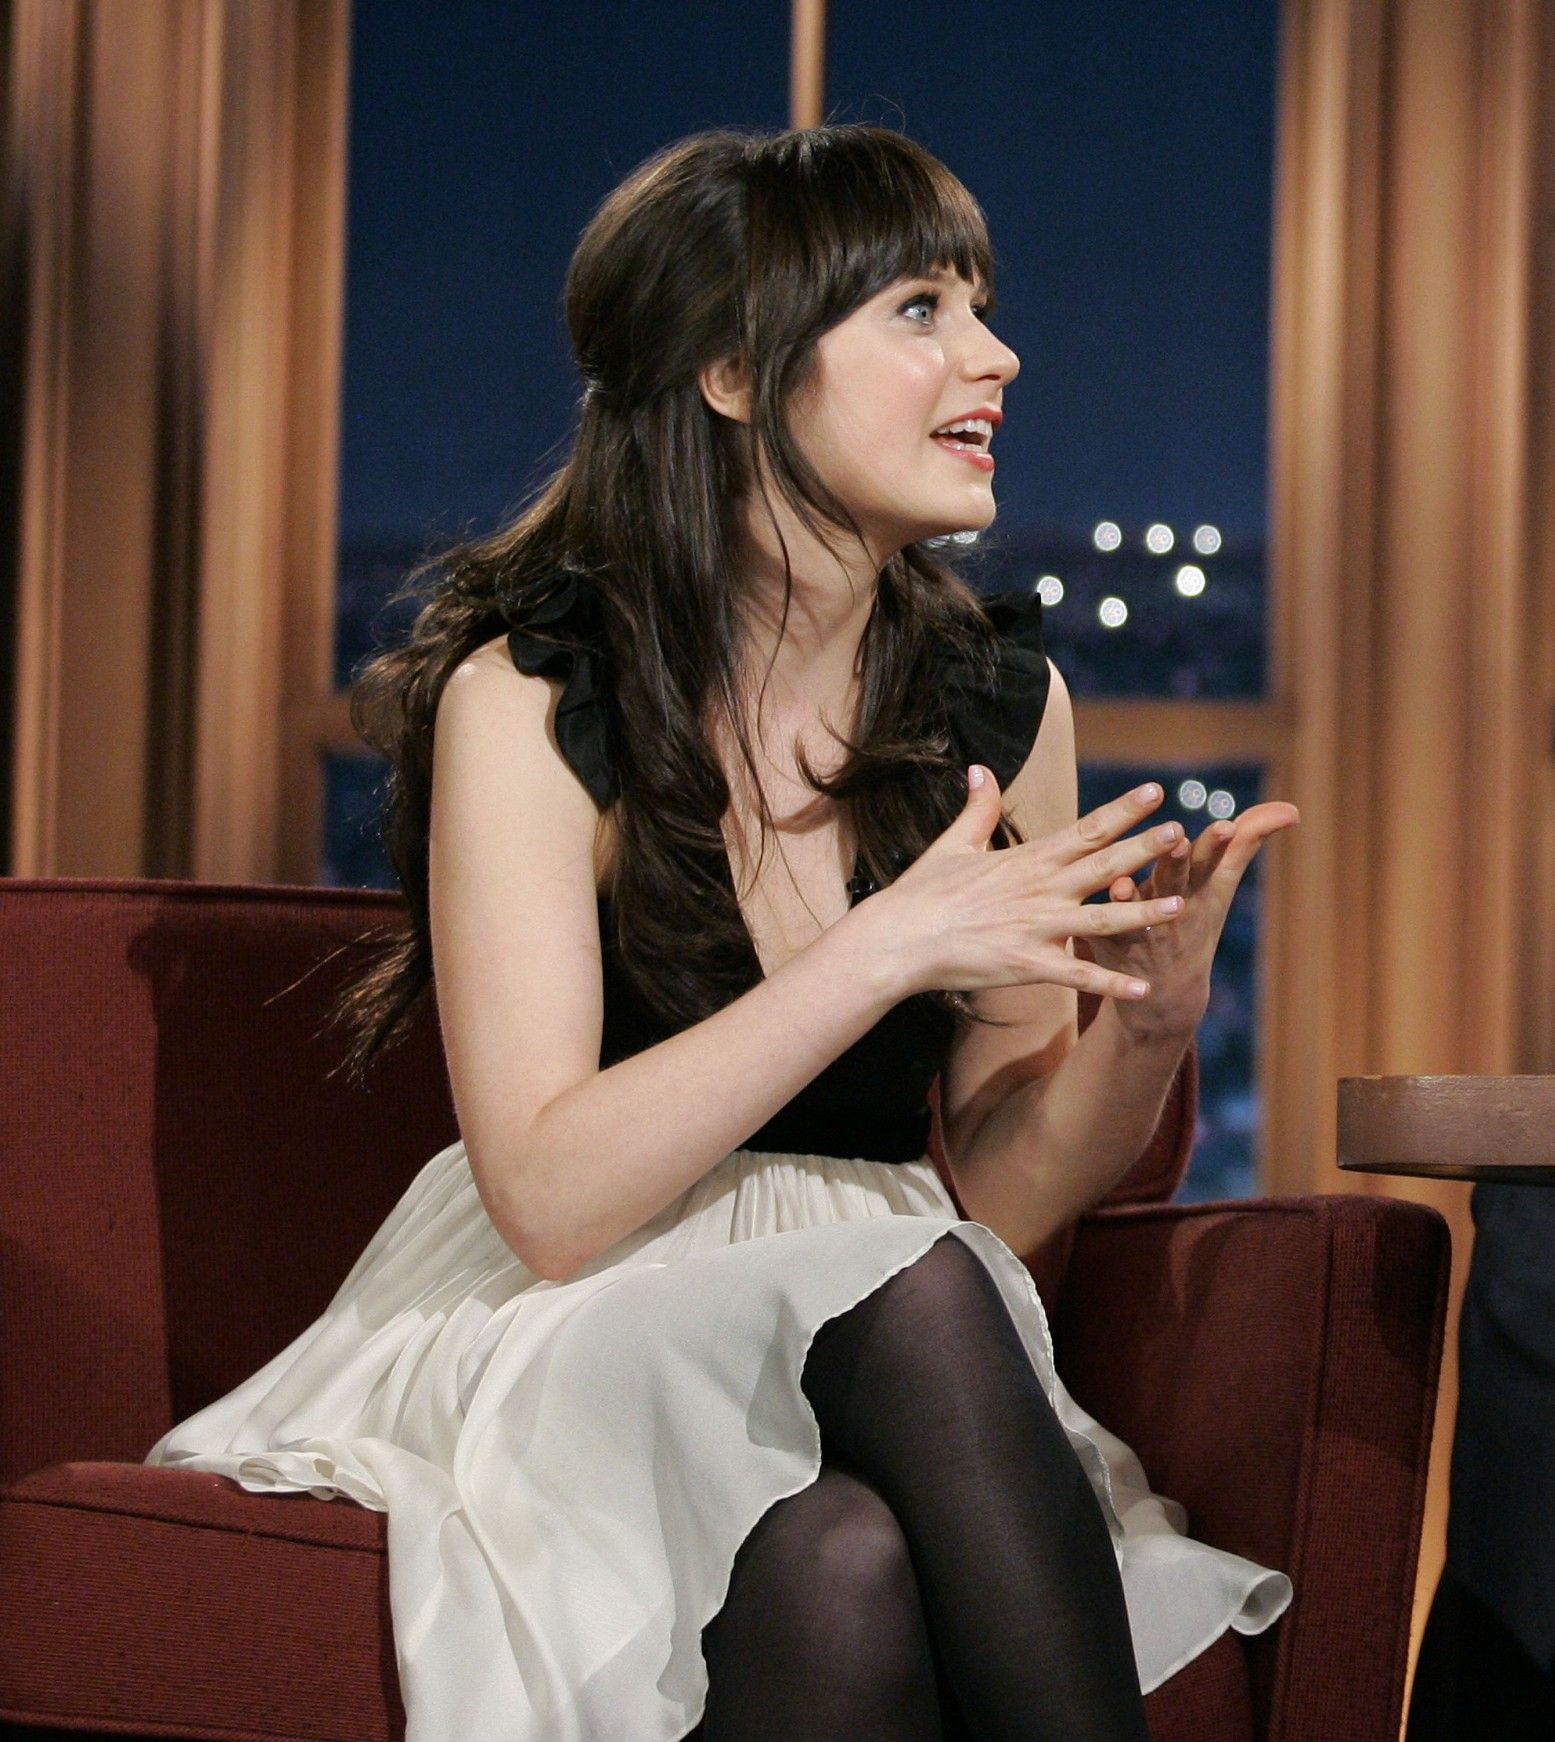 zaavip.com imagesize:956-1440@ Zooey Deschanel in black pantyhose, white silk skirt and black top at the  Late Night Show | Celebrity Tights | Pinterest | Natt, Kjolar och Svart